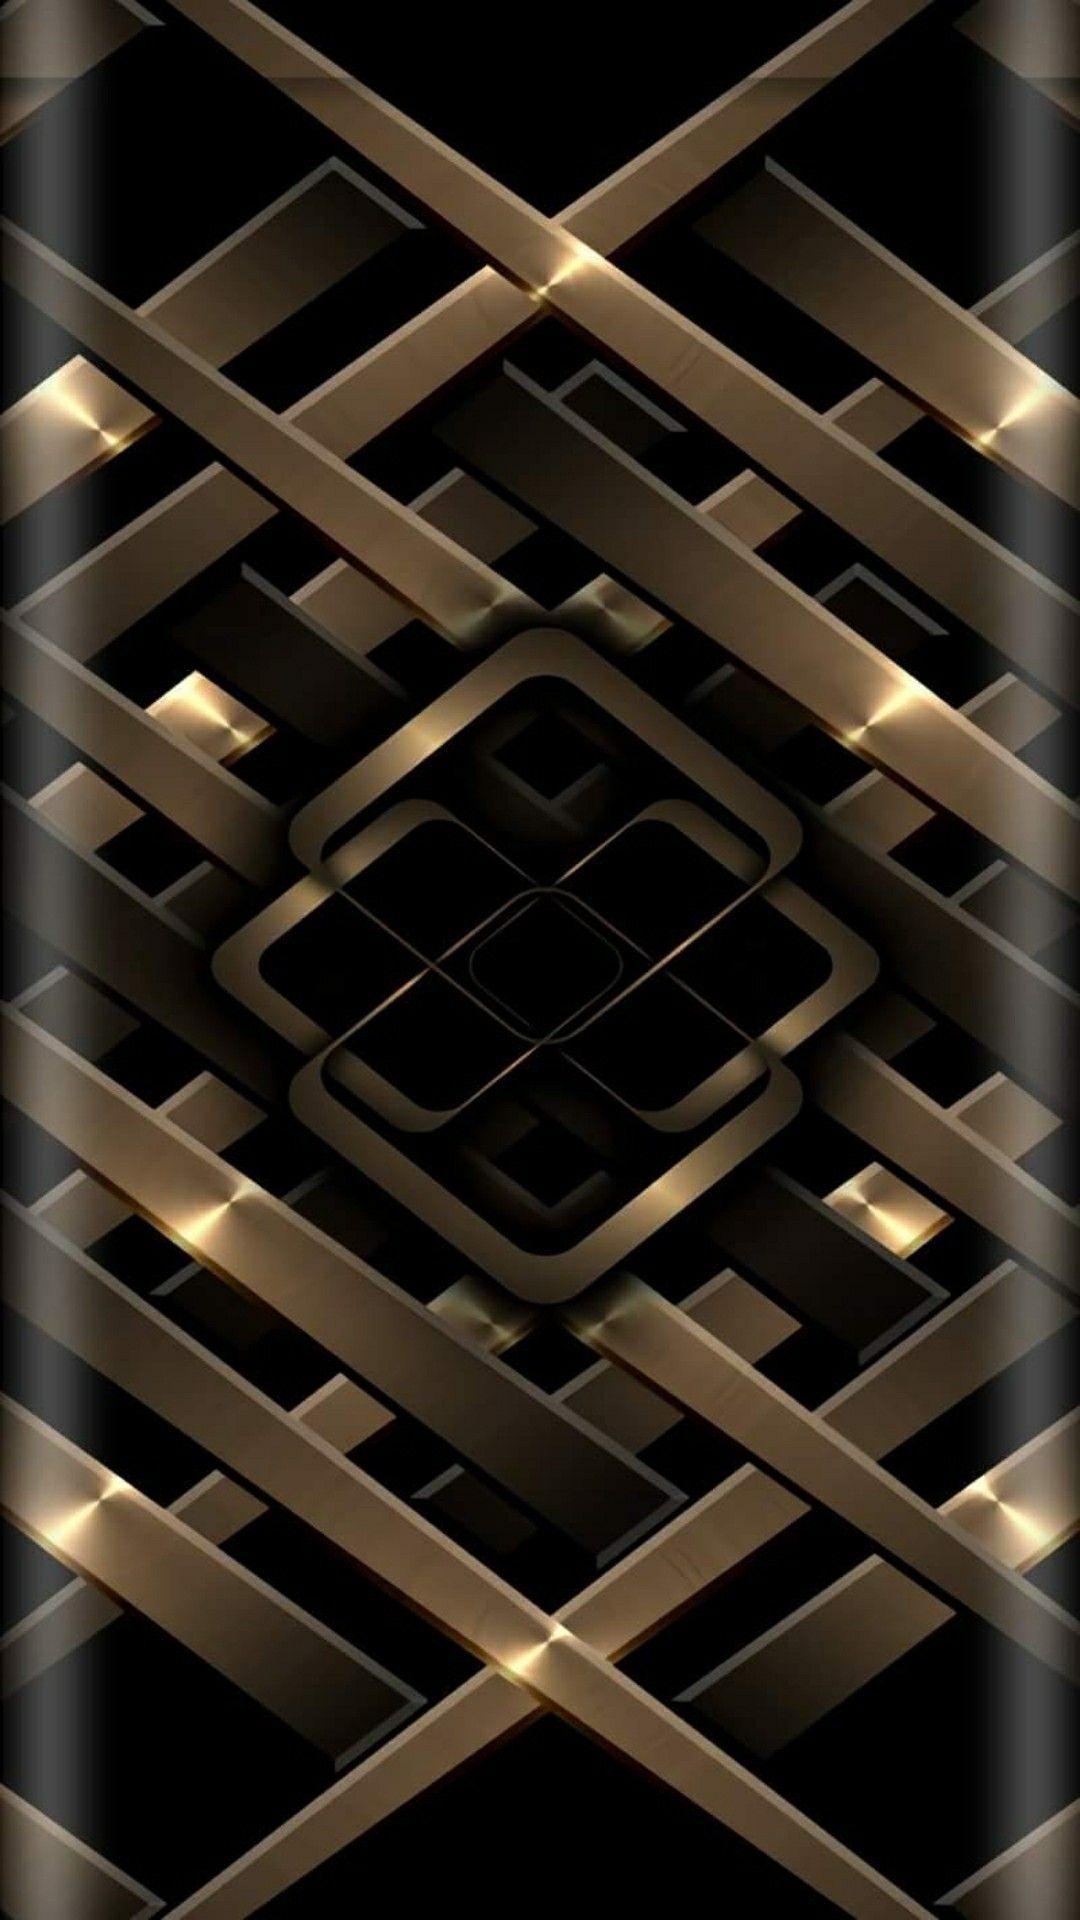 Metal Gold Black Iphone Wallpaper